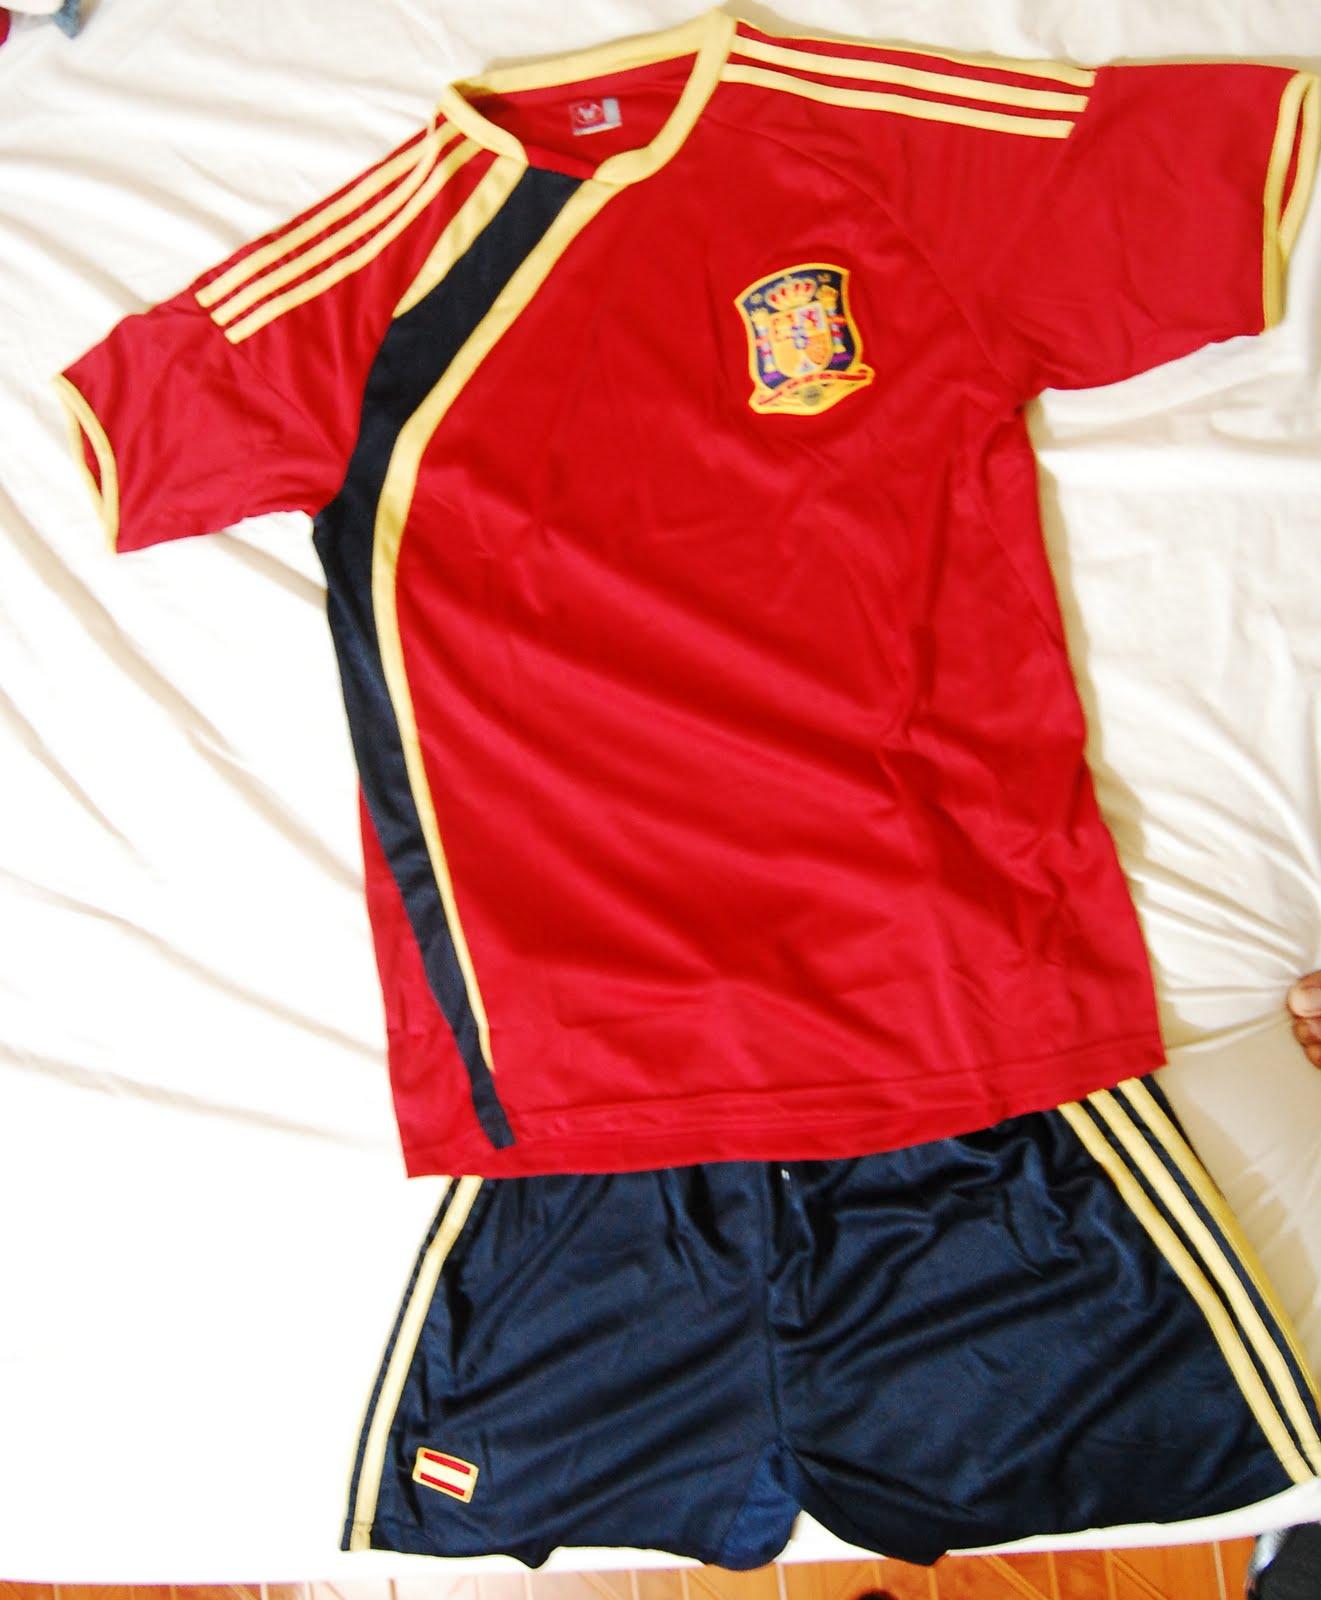 Where to Buy Football Jerseys in Divisoria  9ba0a0eabd27